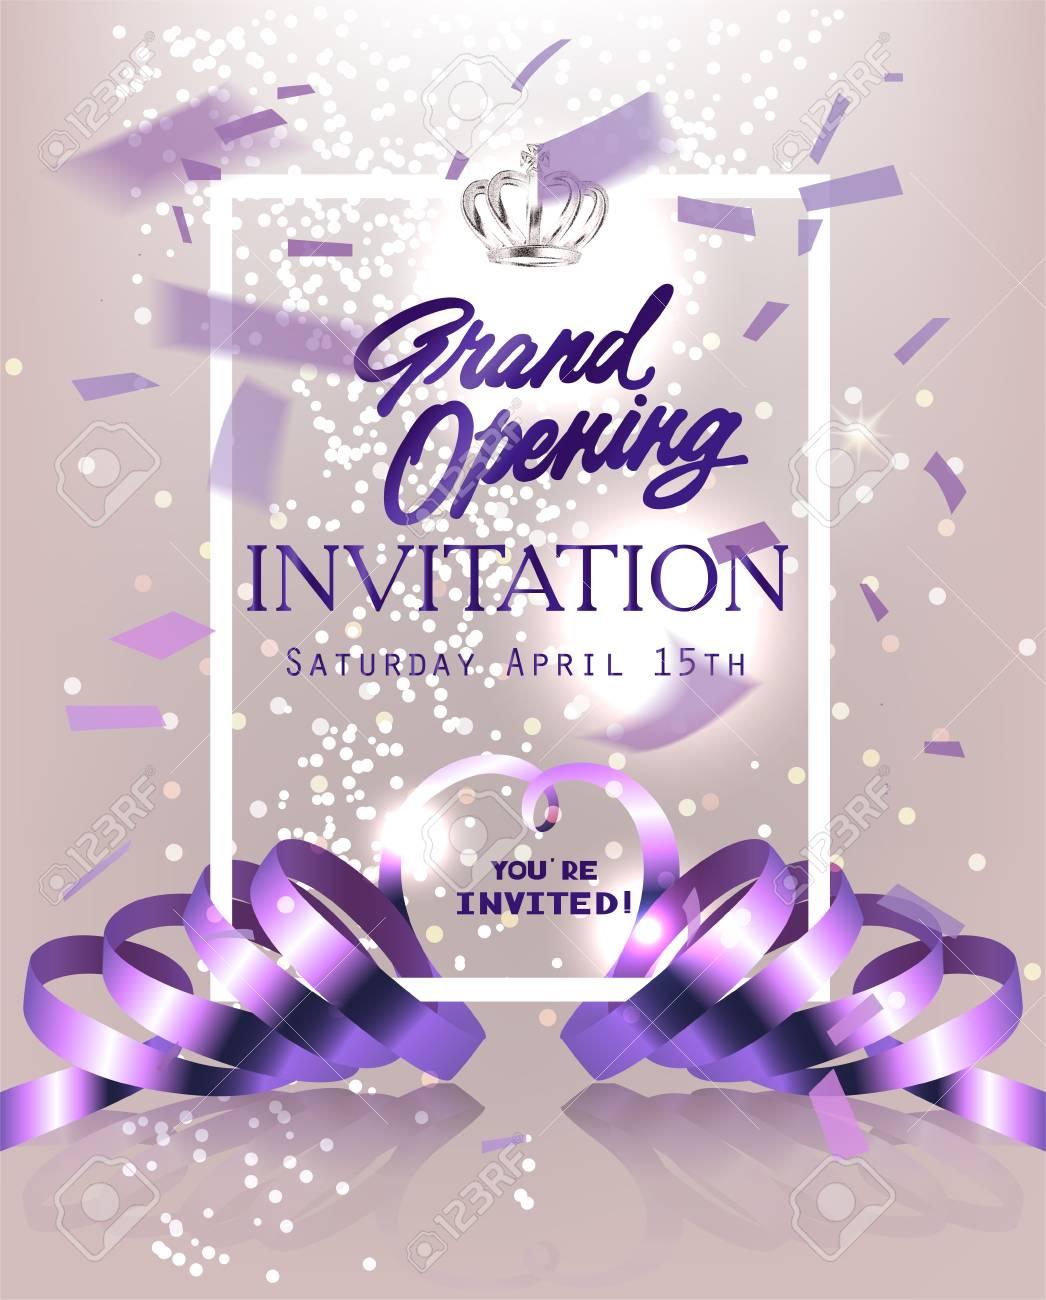 Texte Invitation Inauguration